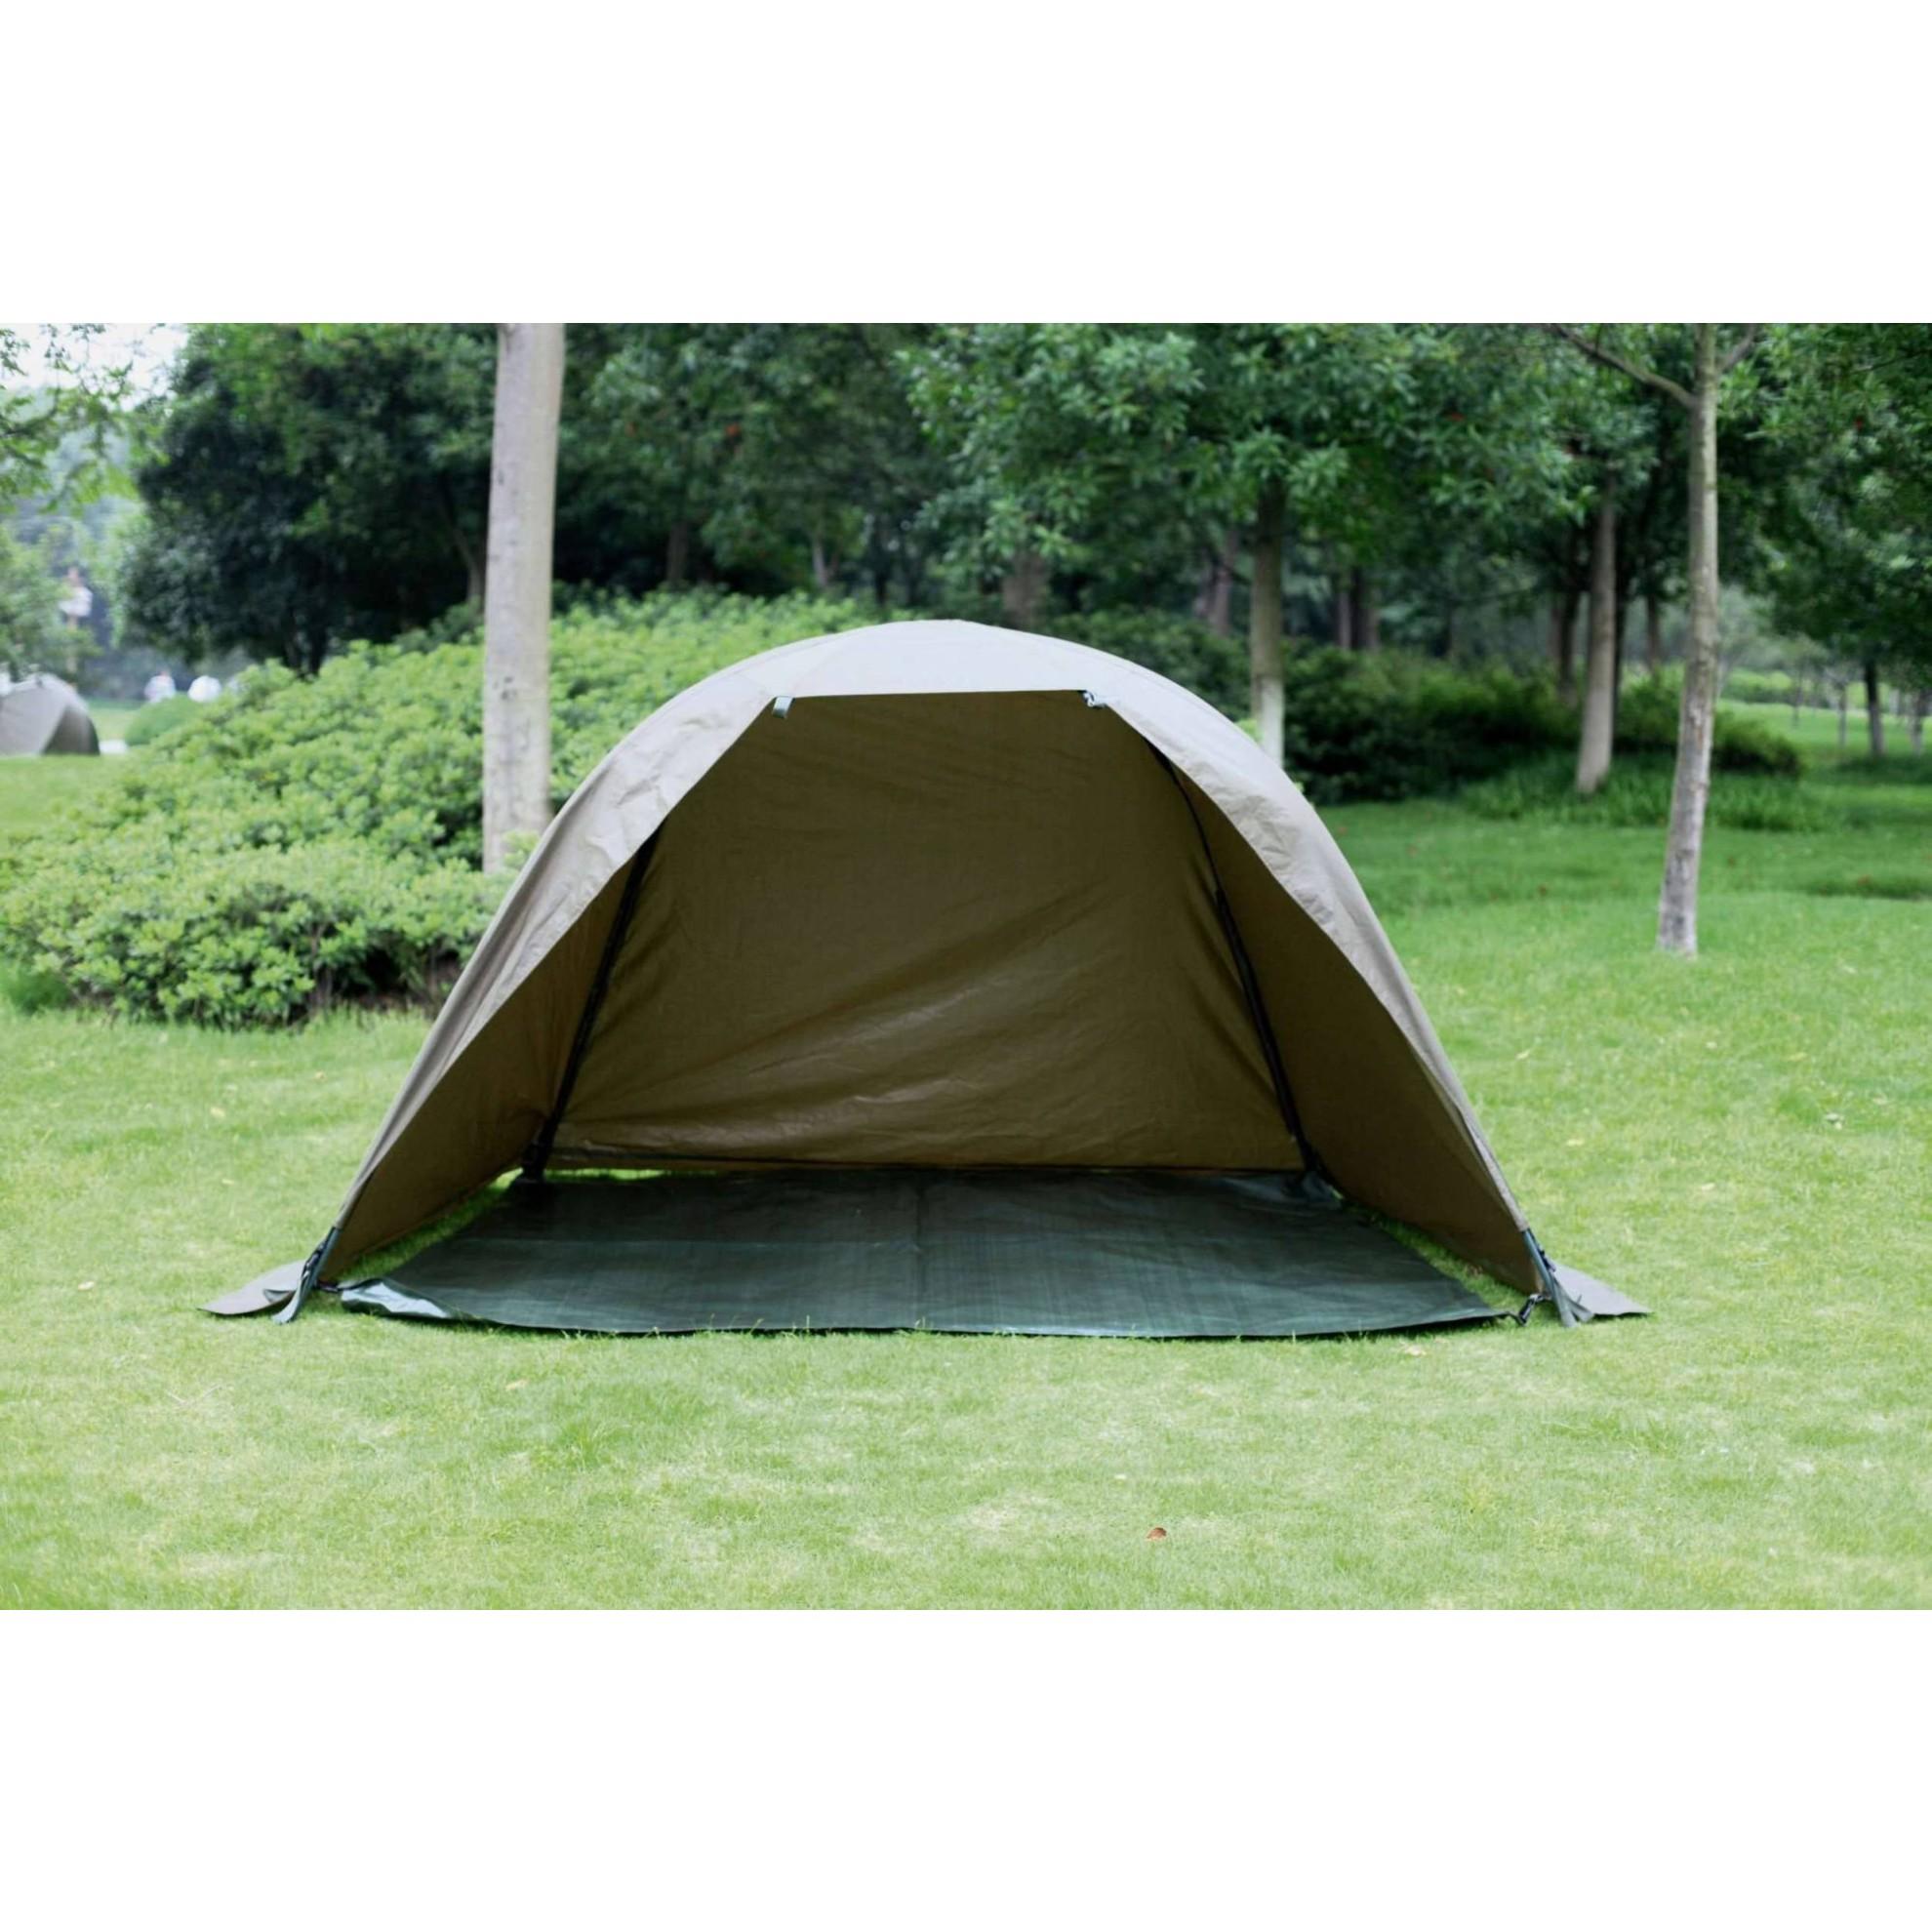 Pelzer Quick Setup Shelter 230 x 130 x 140 cm  sc 1 st  Fishingtackle24 & Pelzer Quick Setup Shelter 230 x 130 x 140 cm Fishingtackle24 ...